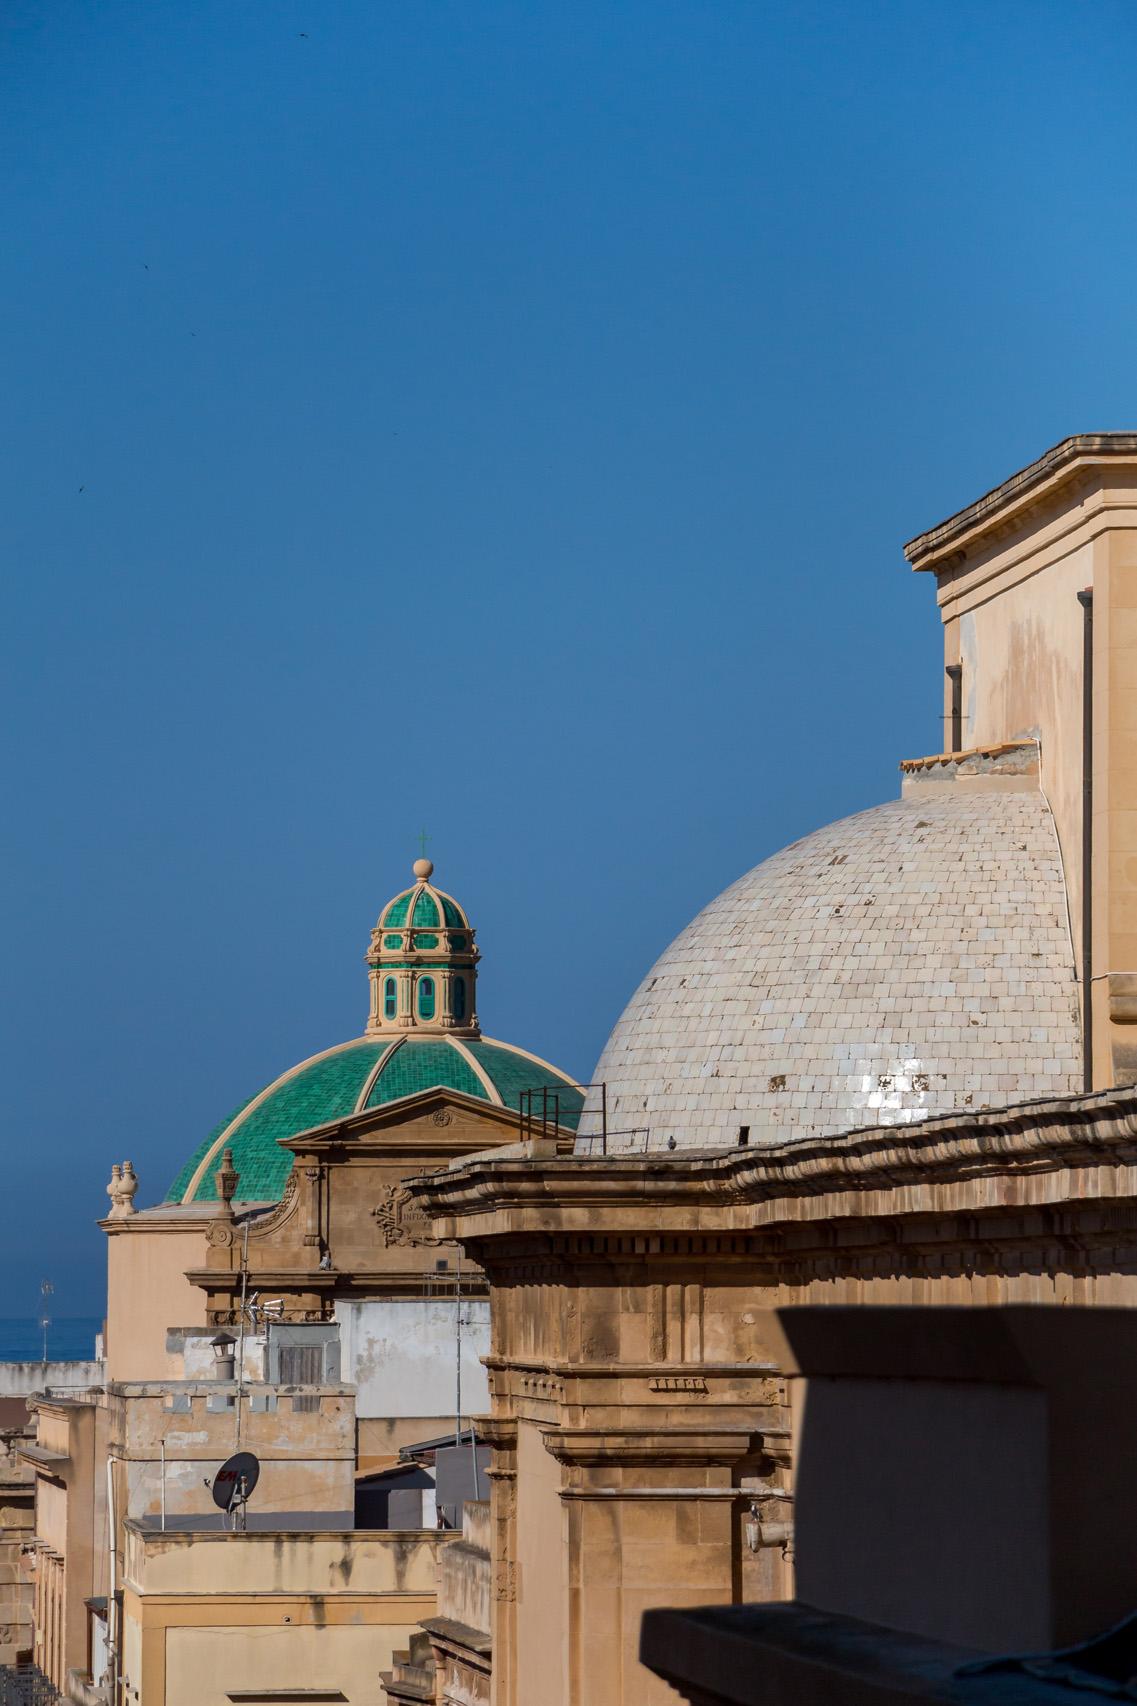 Roofs of Marsala, Sicily